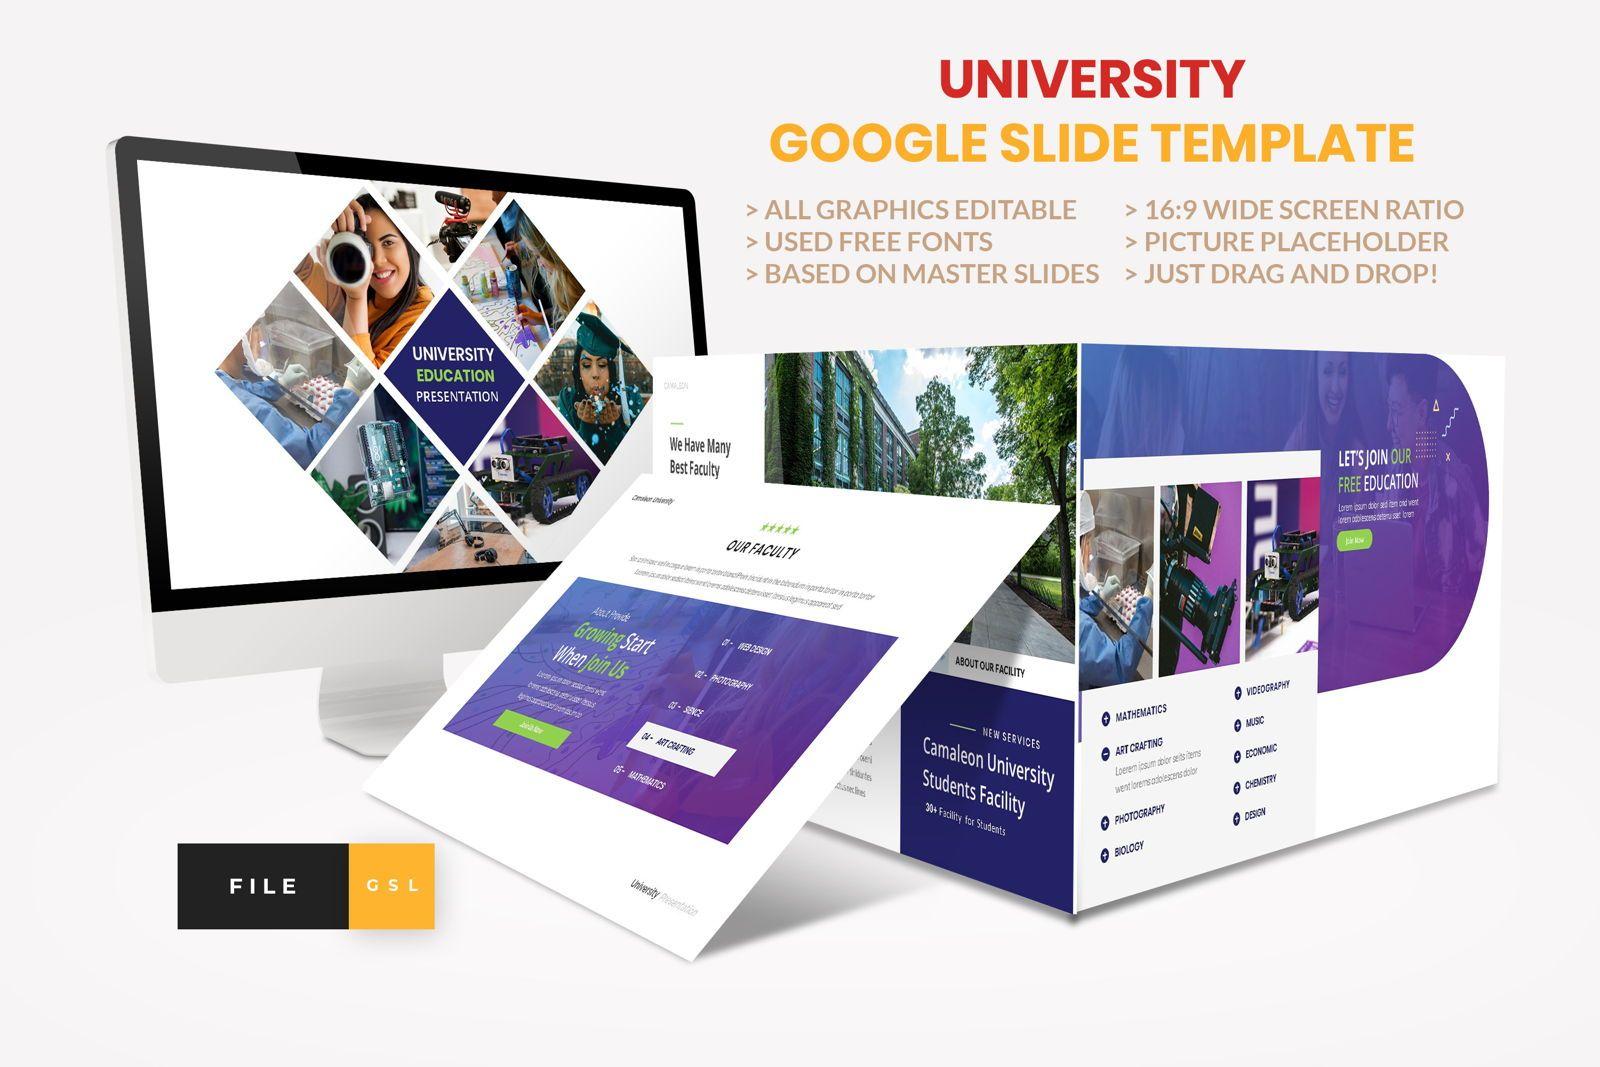 University - Education College Google Slide Template, 08550, Presentation Templates — PoweredTemplate.com